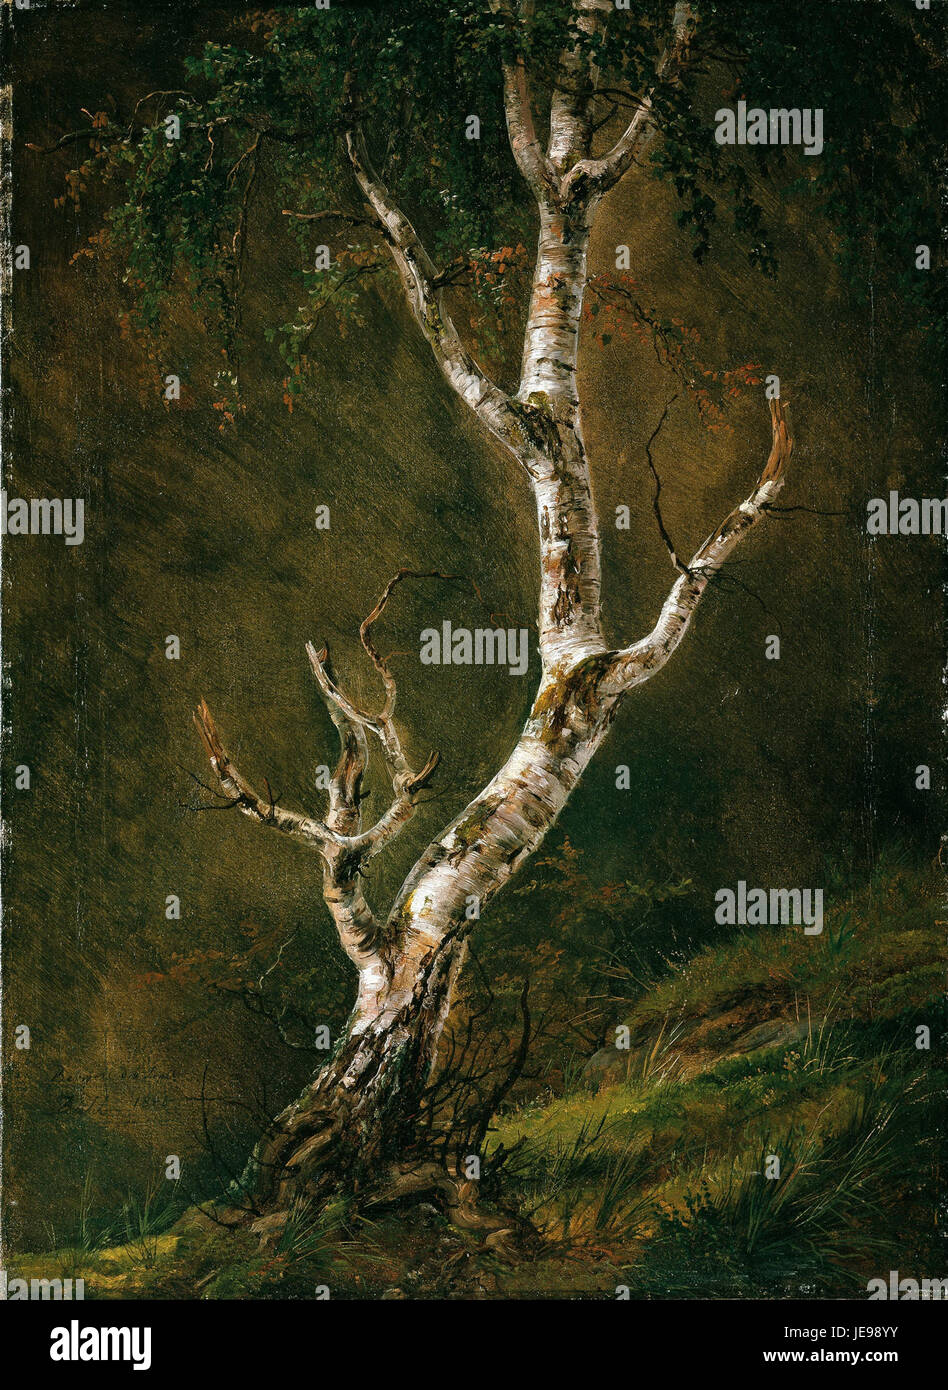 Johan Christian Dahl - Study of a Birch Tree - Stock Photo